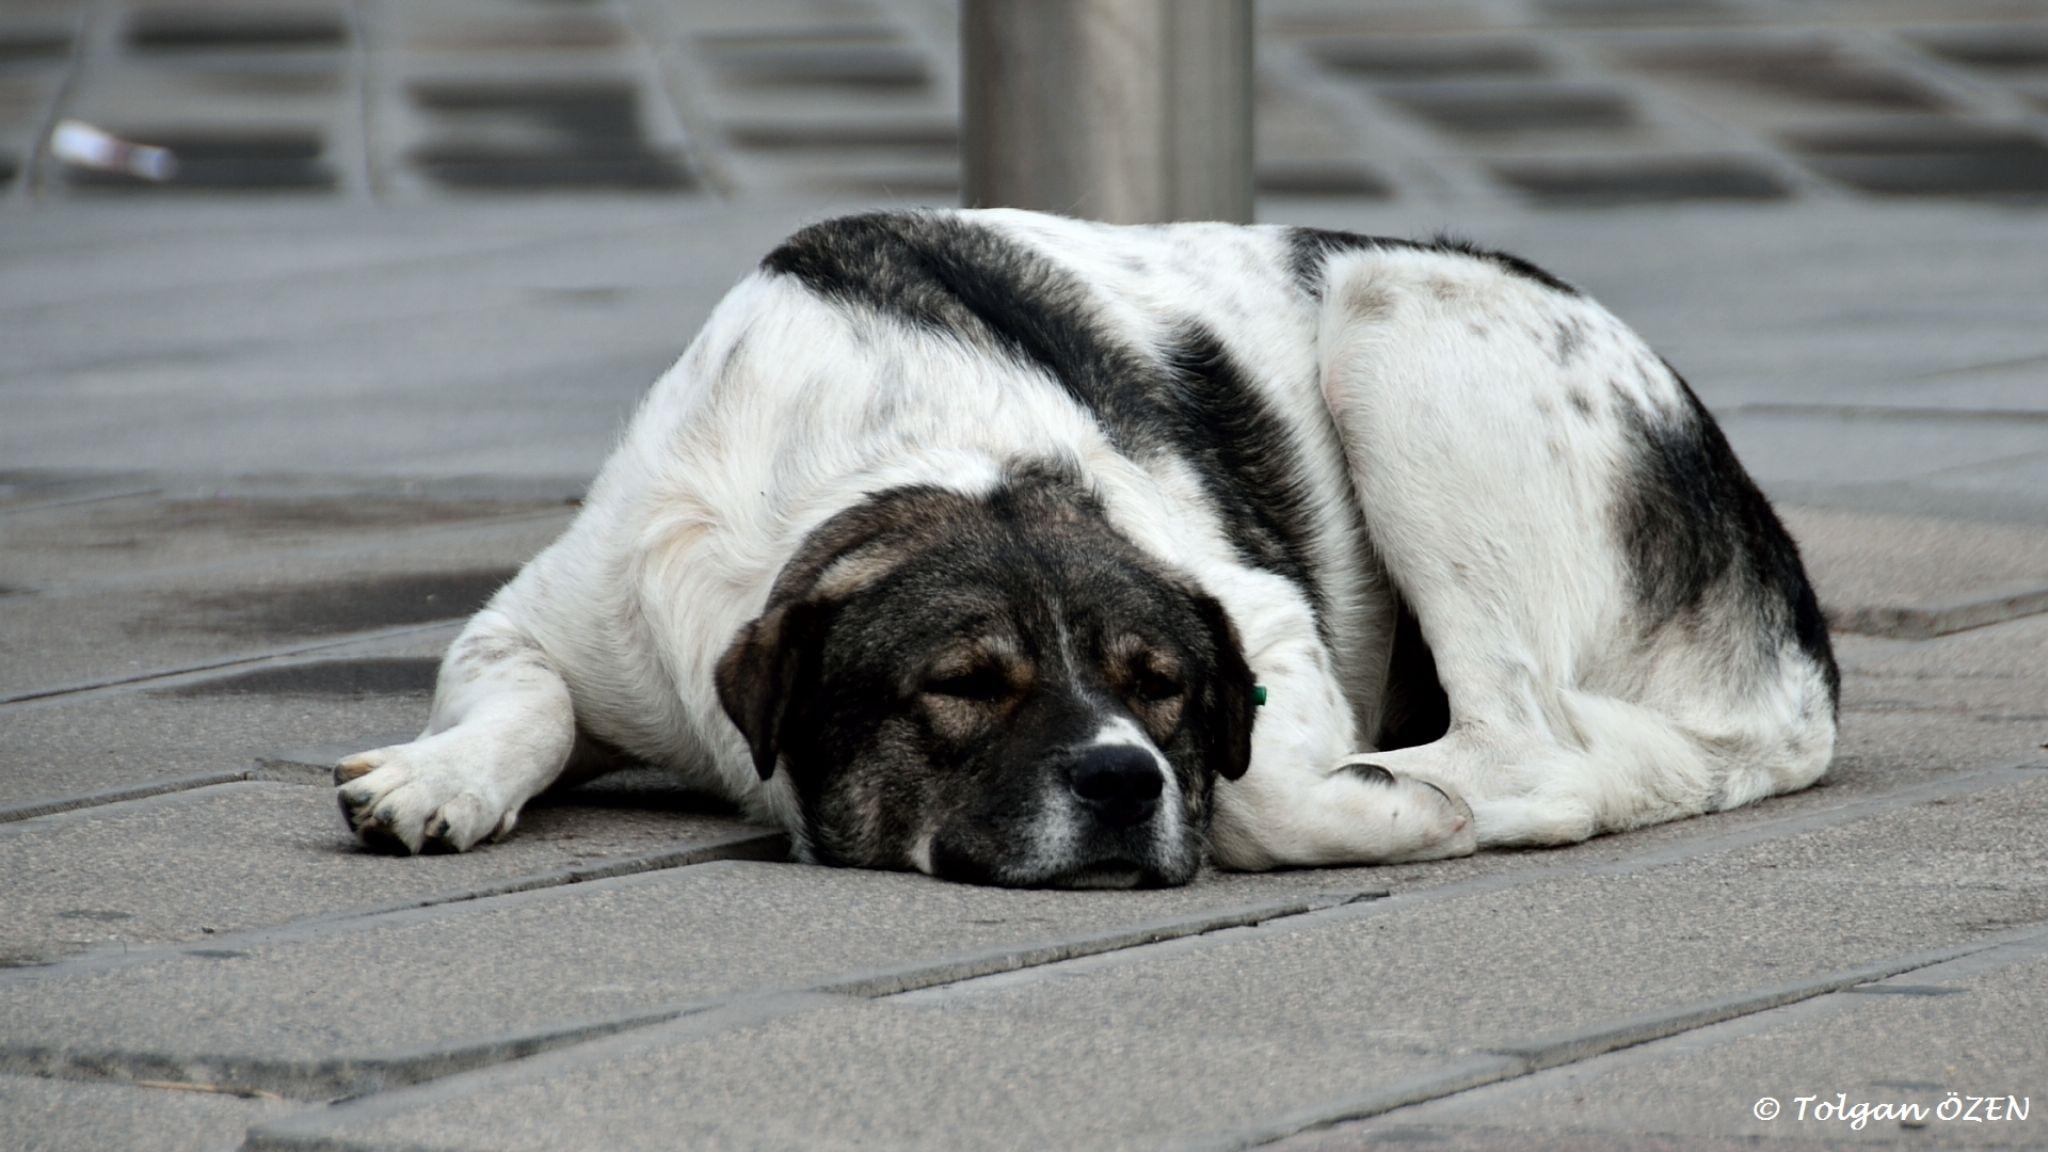 Resting Doggy by Tolgan ÖZEN